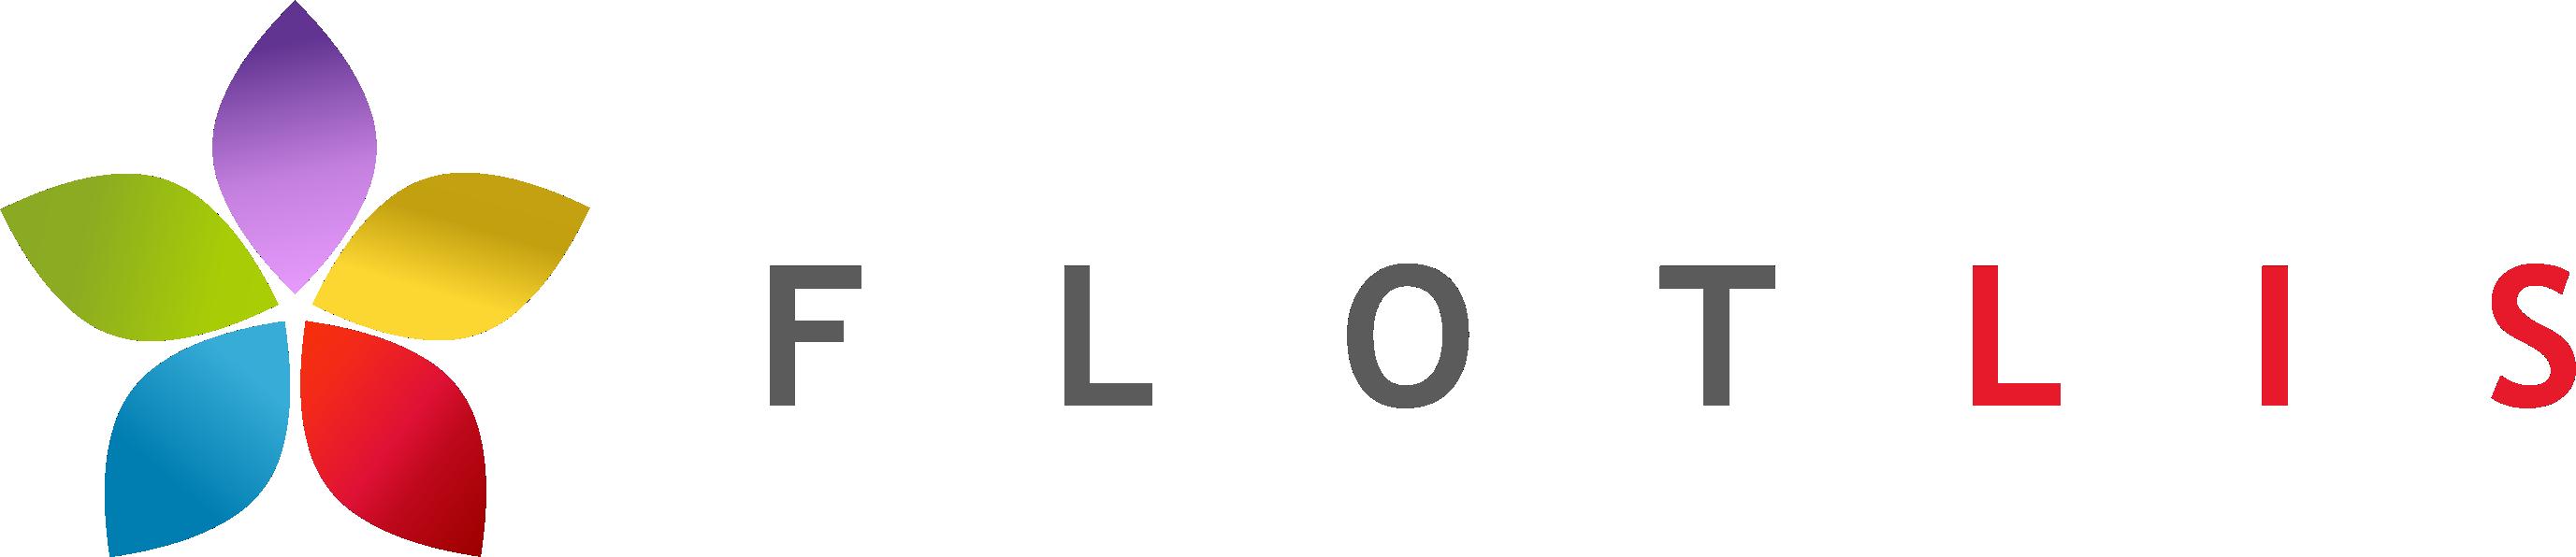 Flotlis